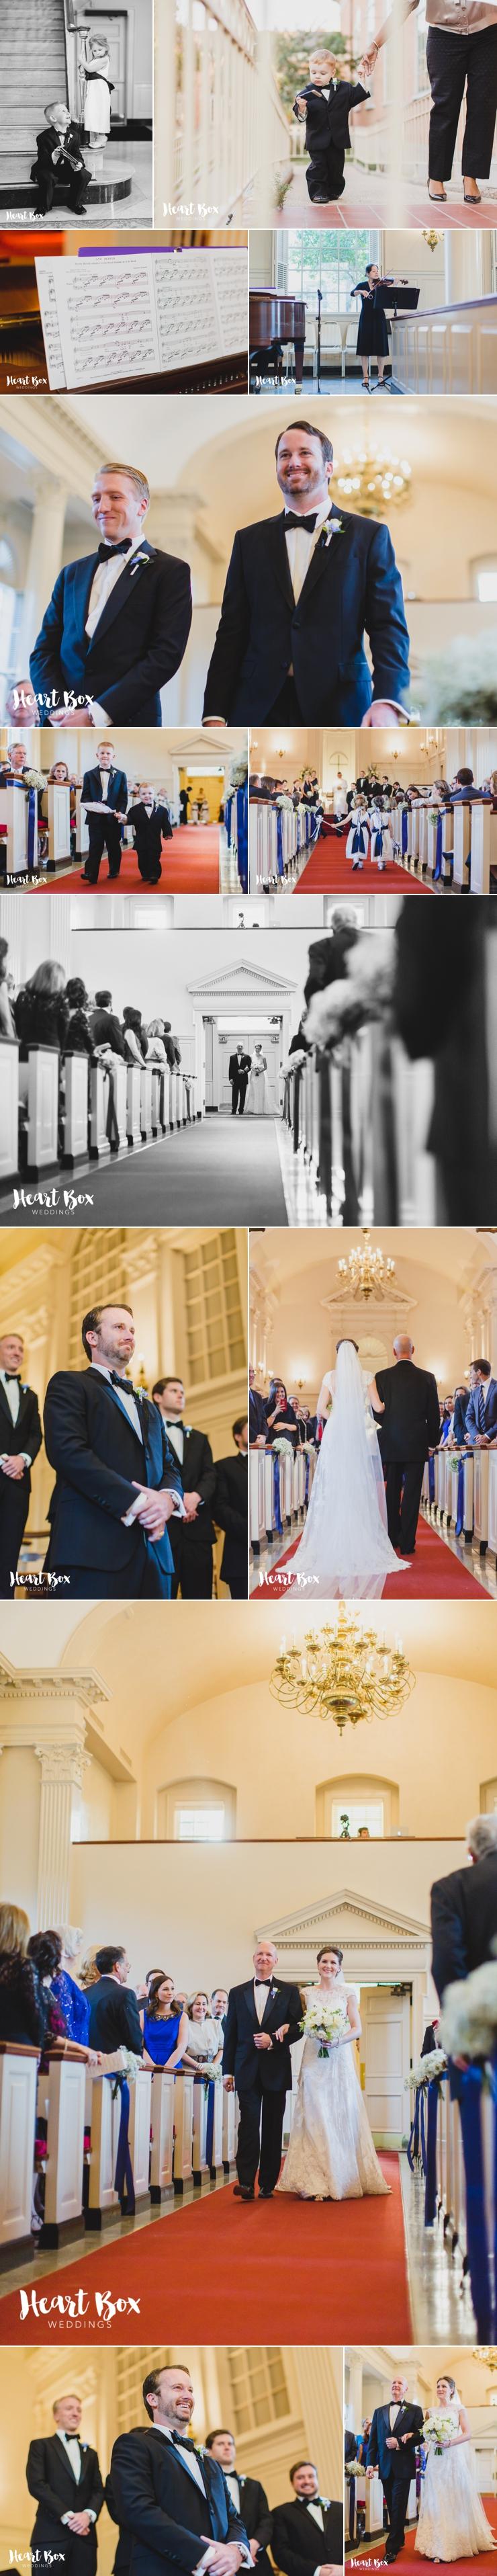 Anthony Wedding Blog Collages 12.jpg